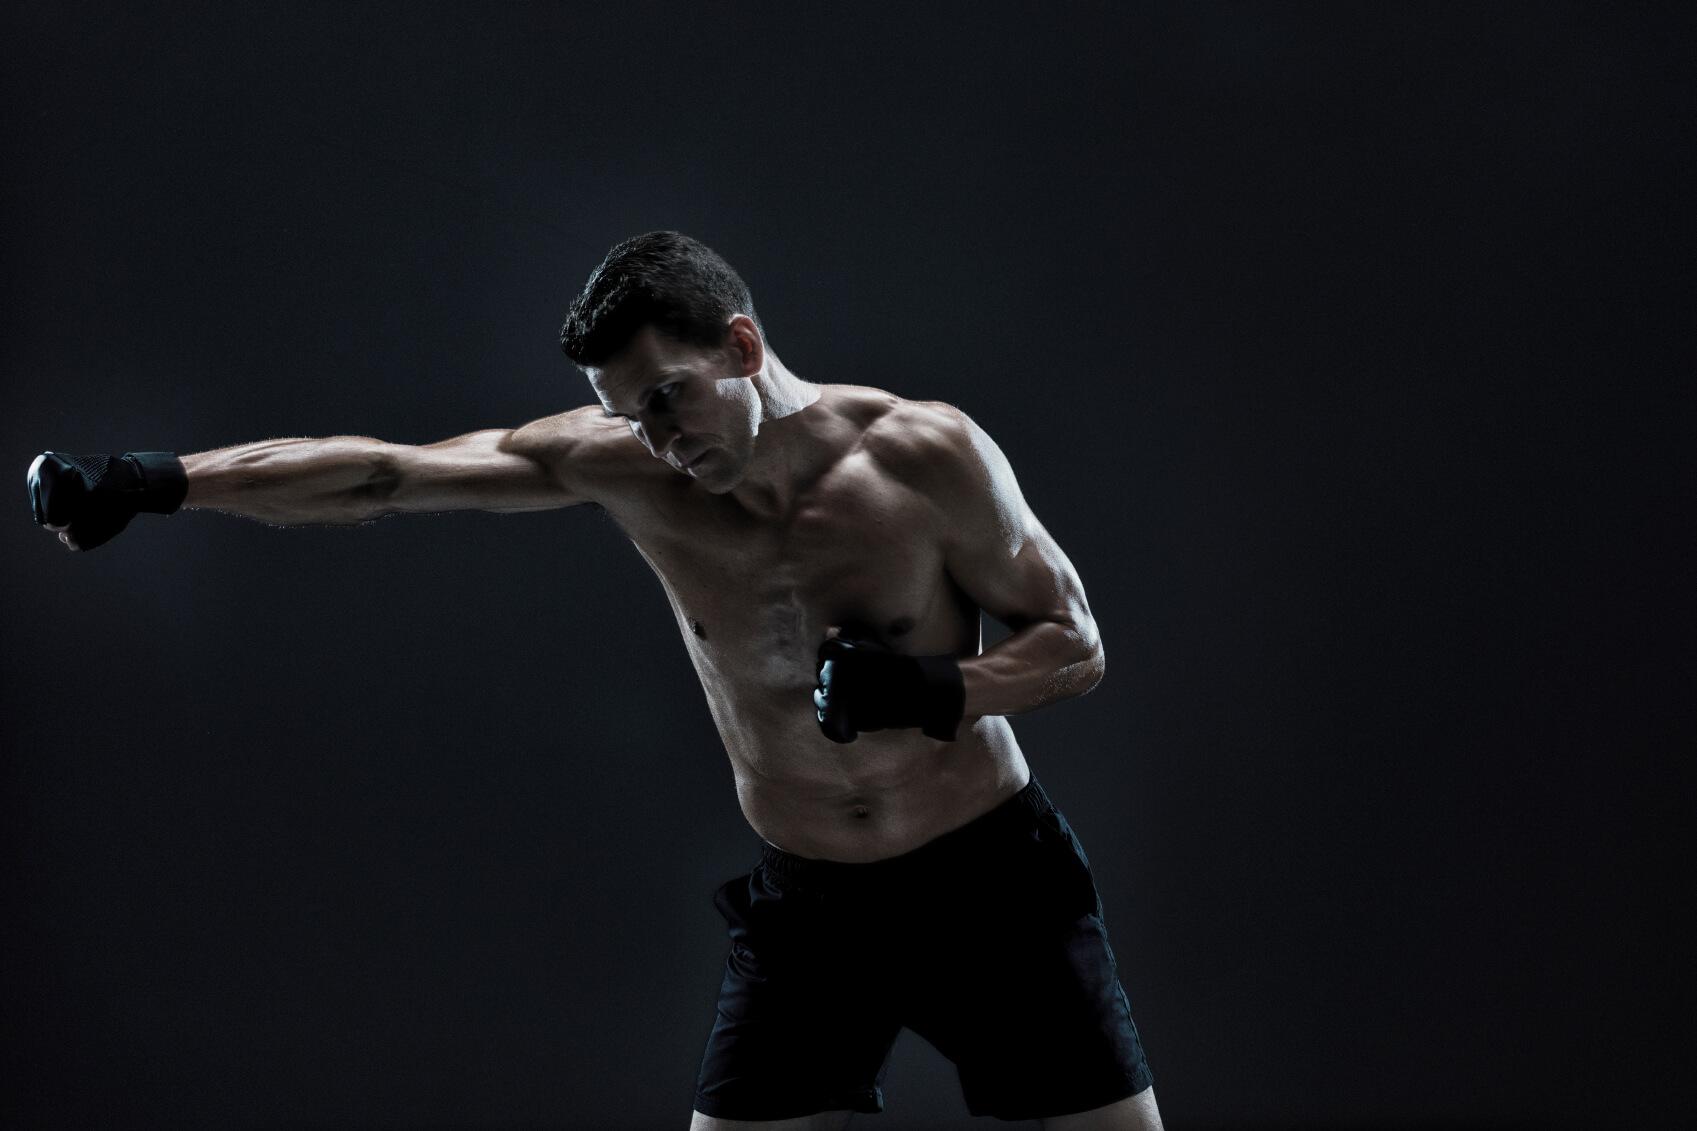 chiropractic alignment